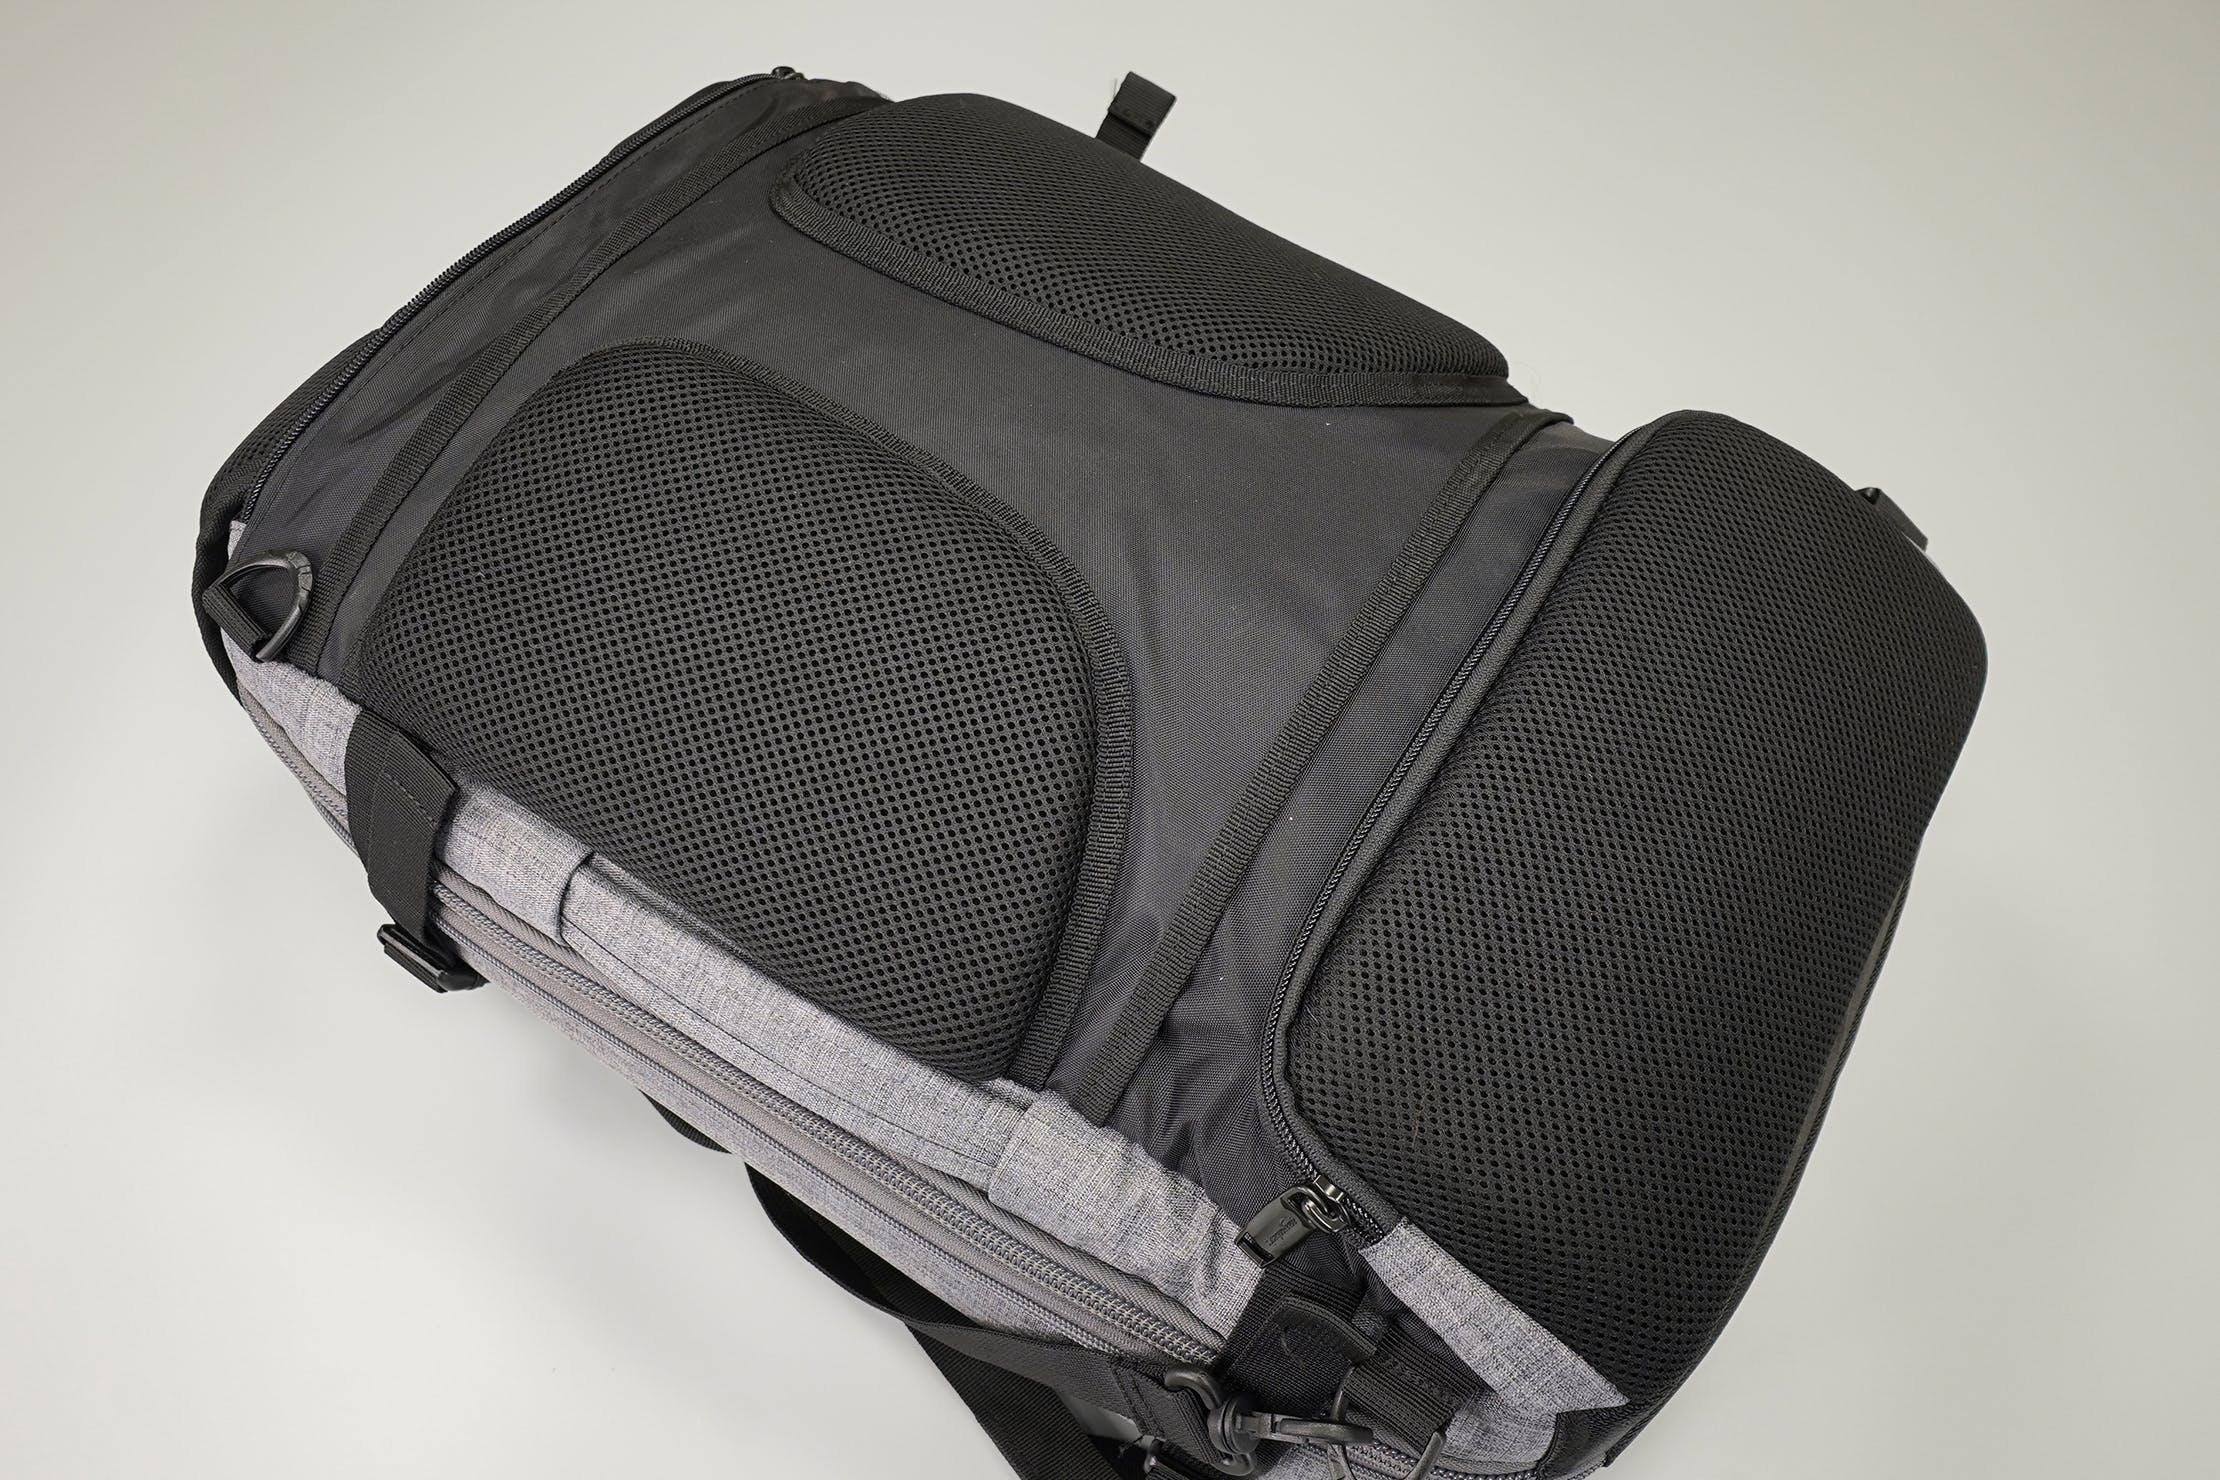 AmazonBasics Slim Travel Backpack Weekender Back Panel